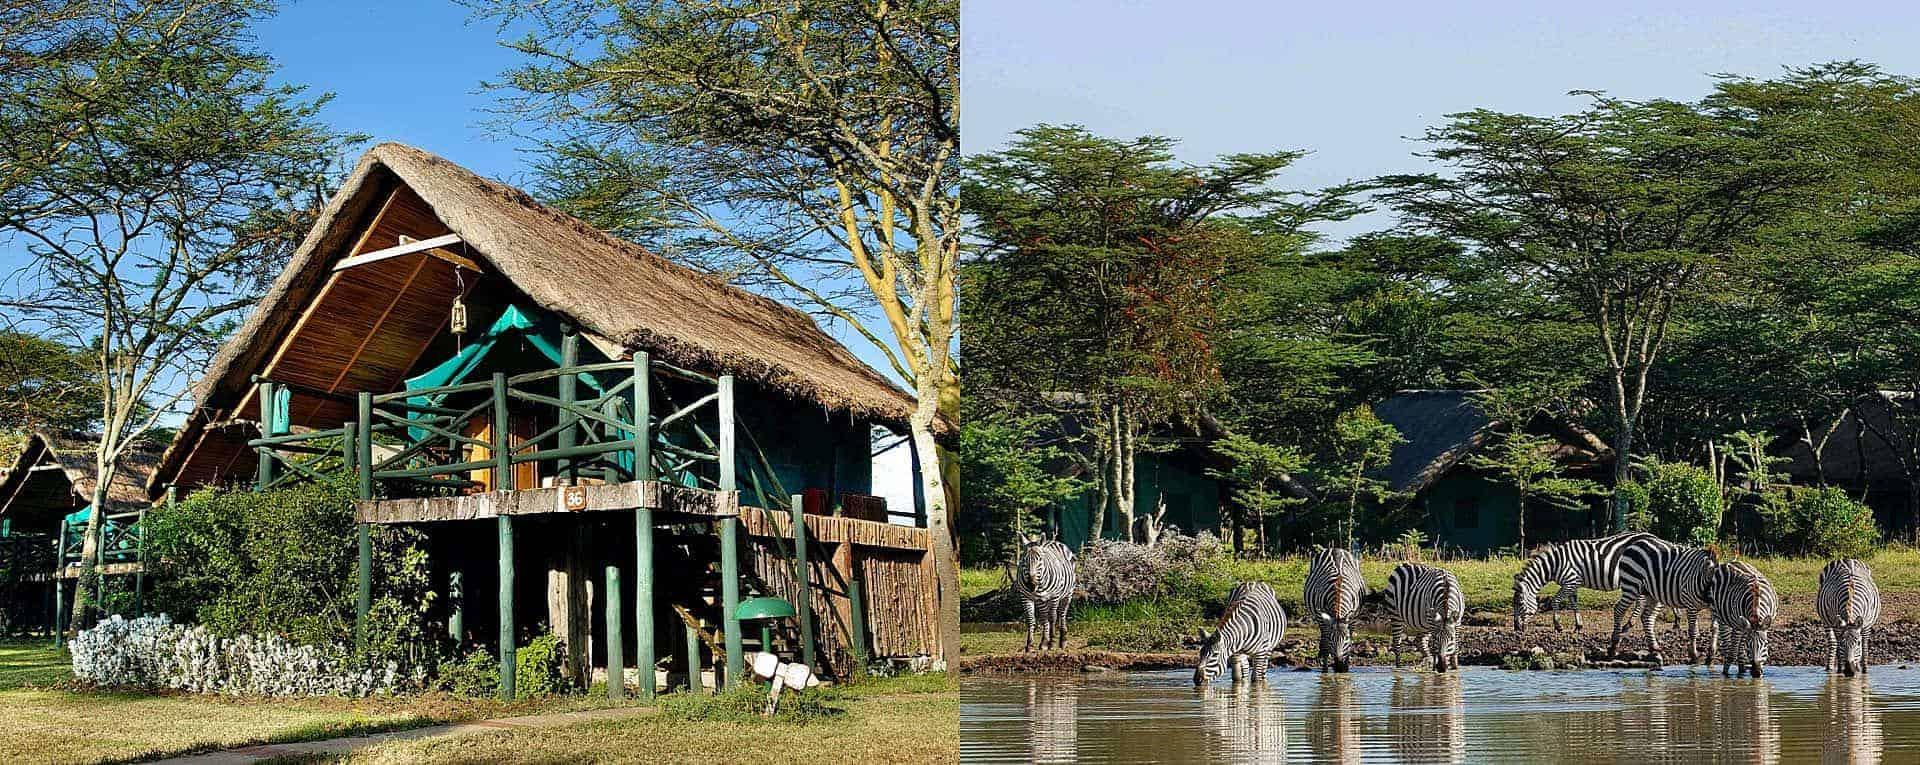 Sweetwaters Serena Camp Laikipia Kenya Africanmecca